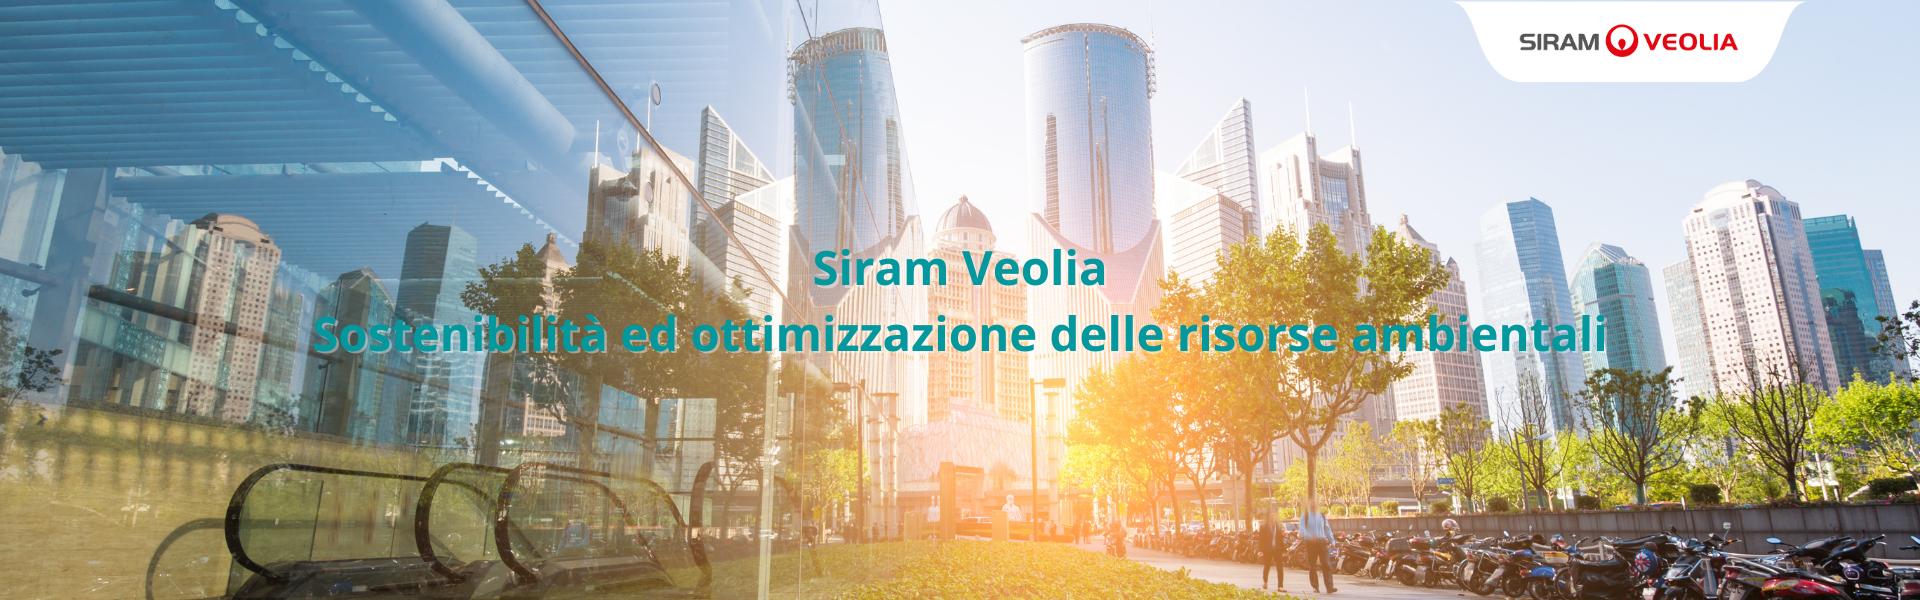 Siram Veolia - Platinum Sponsor